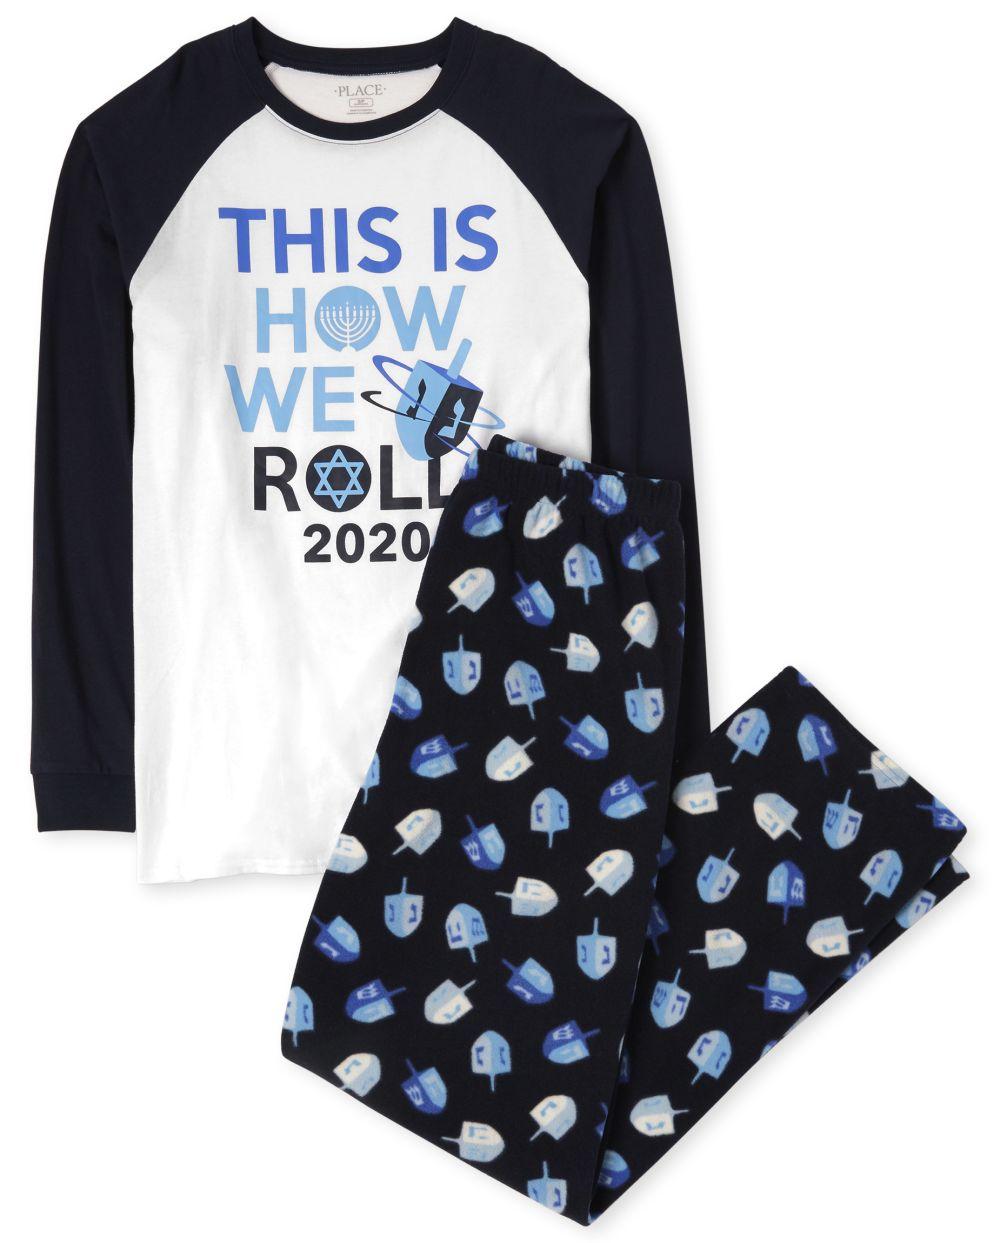 Unisex Adult Matching Family Hanukkah Festival Cotton And Fleece Pajamas - Blue